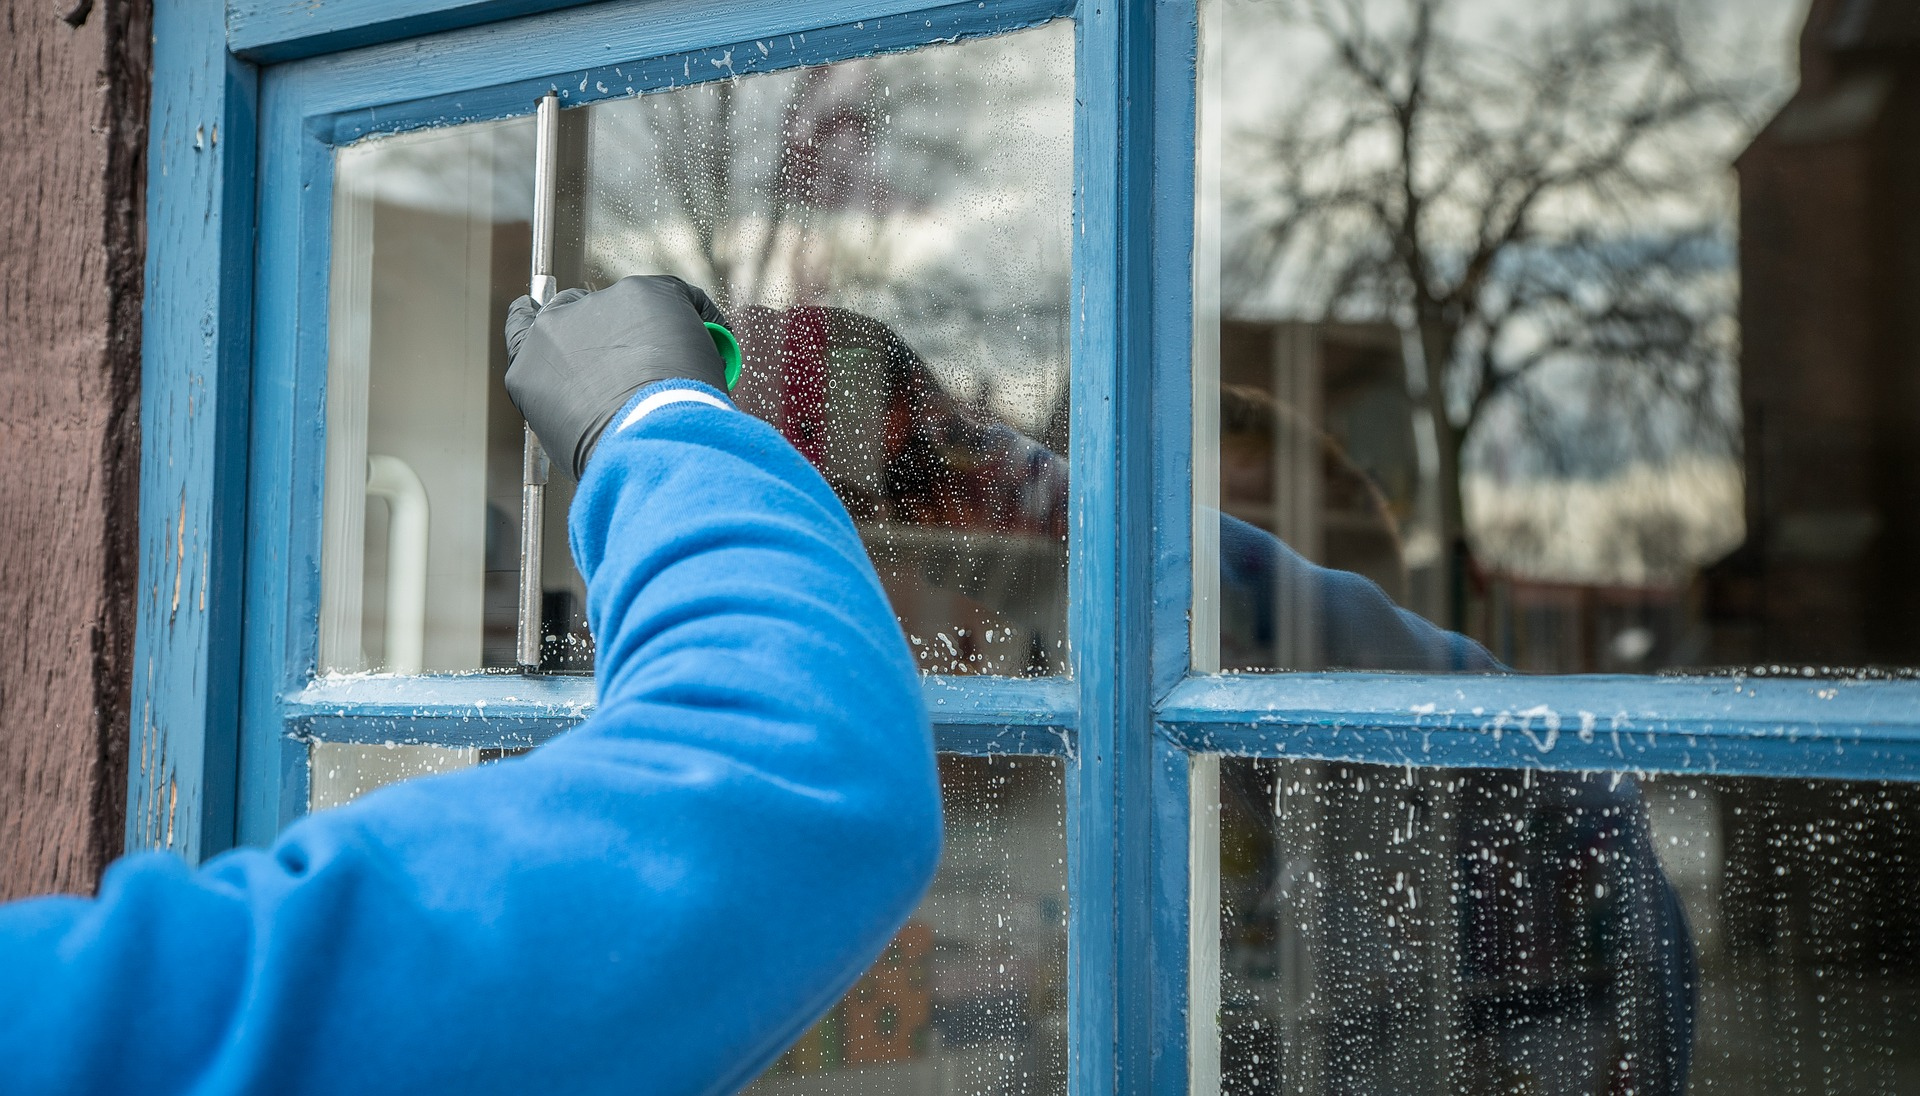 window-cleaning-2151818_1920.jpg